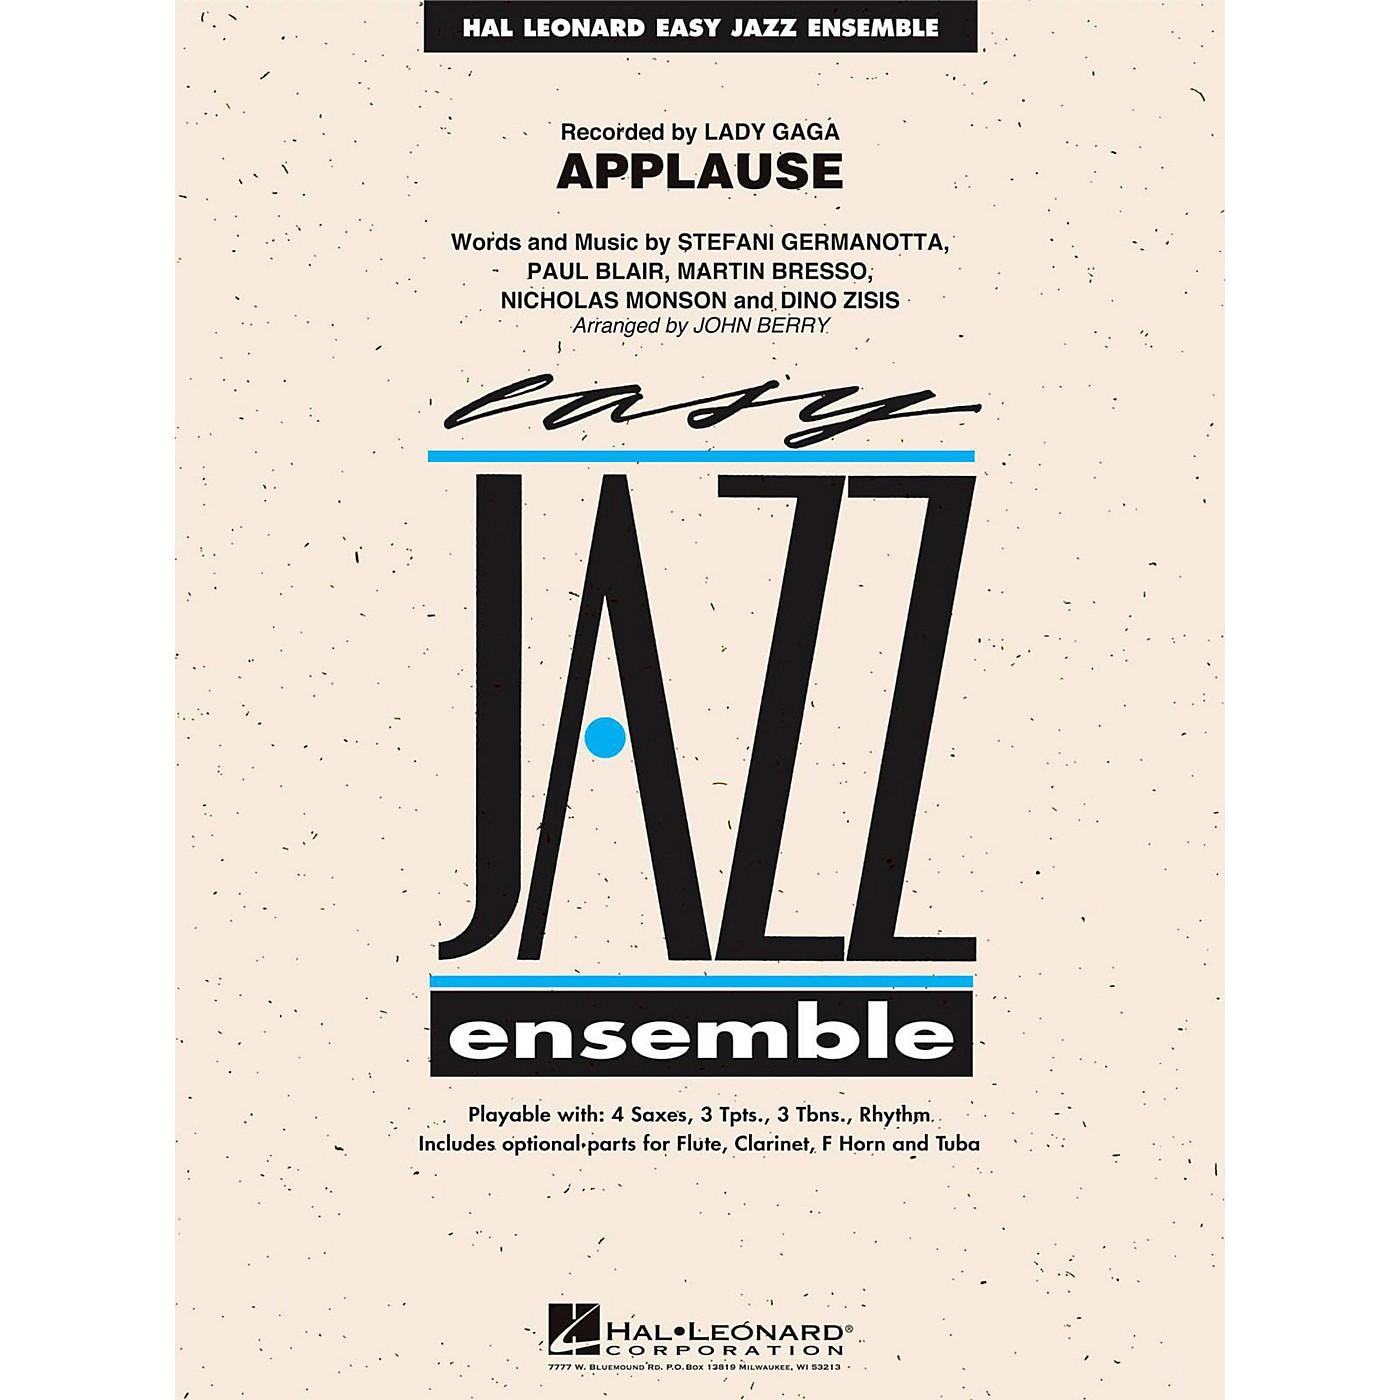 Hal Leonard Applause - Easy Jazz Ensemble Series Level 2 thumbnail